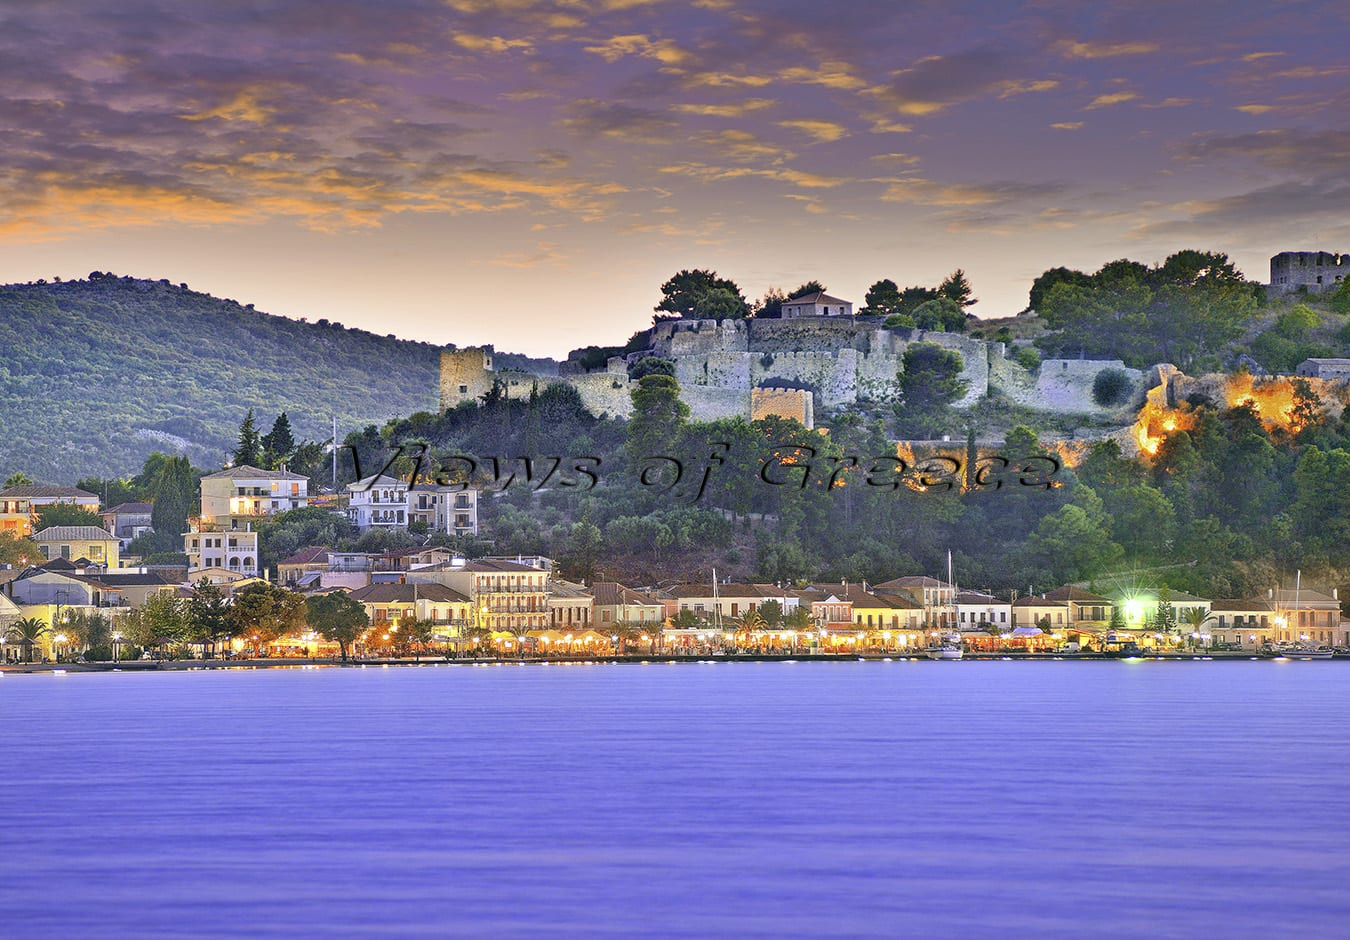 vonitsa, beach, port, castle, historical, etoloakarnania, marina, yachts, greece, amvrakikos, nature, greek, wetland, , lagoon, ambracian gulf, Birdwatching, Αμβρακικός κόλπος, παρατήρηση πουλιών, δελφινάκια Αμβρακικού, Βόνιτσα, κάστρο, παραλίες, λίμνη Κομήτης, Κουκουμίτσα, Αιτωλοακαρνανία